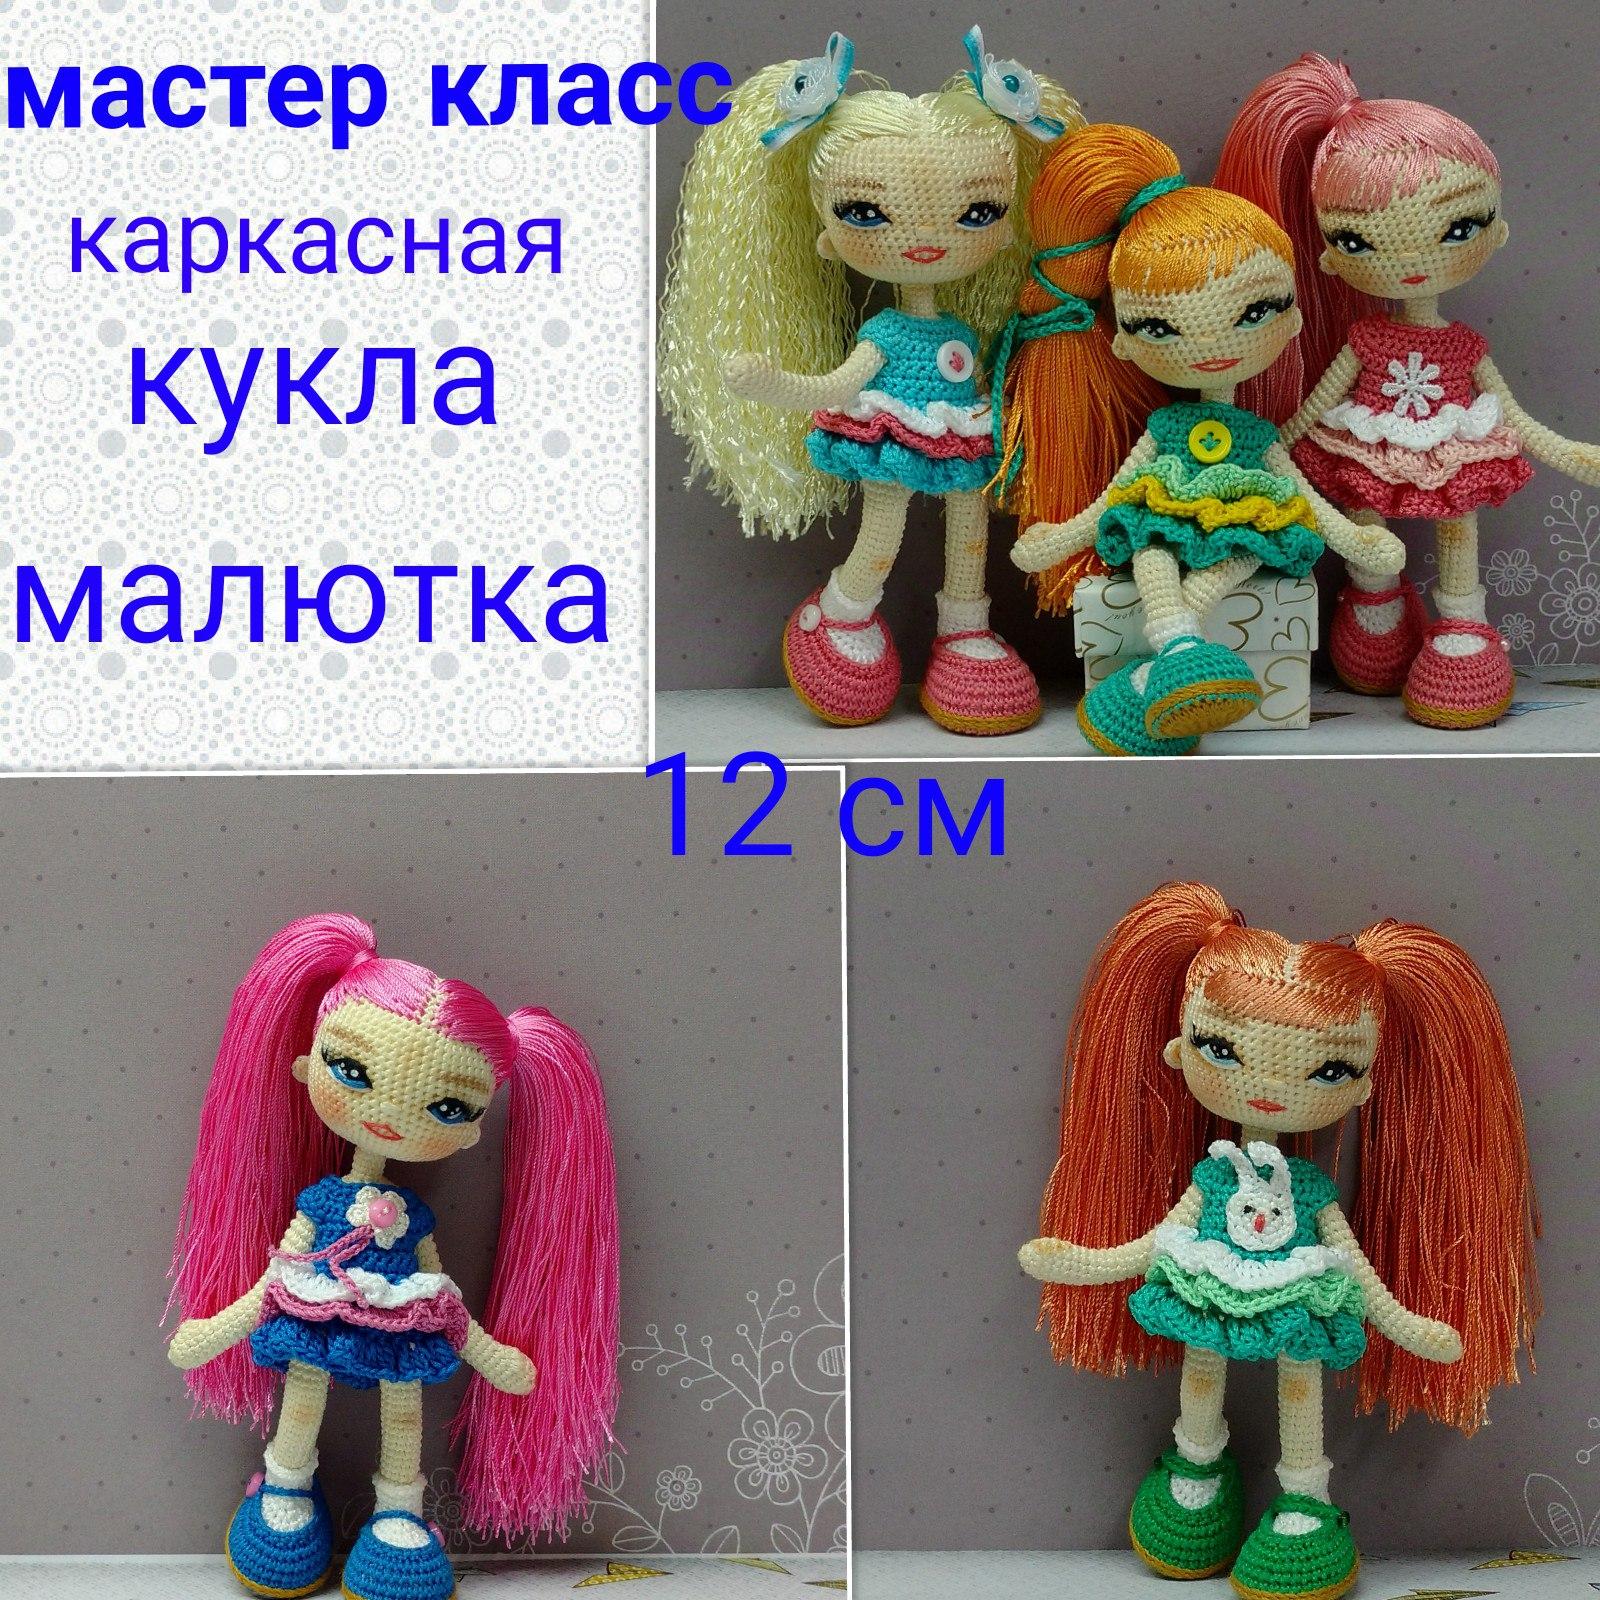 кукла.jpg